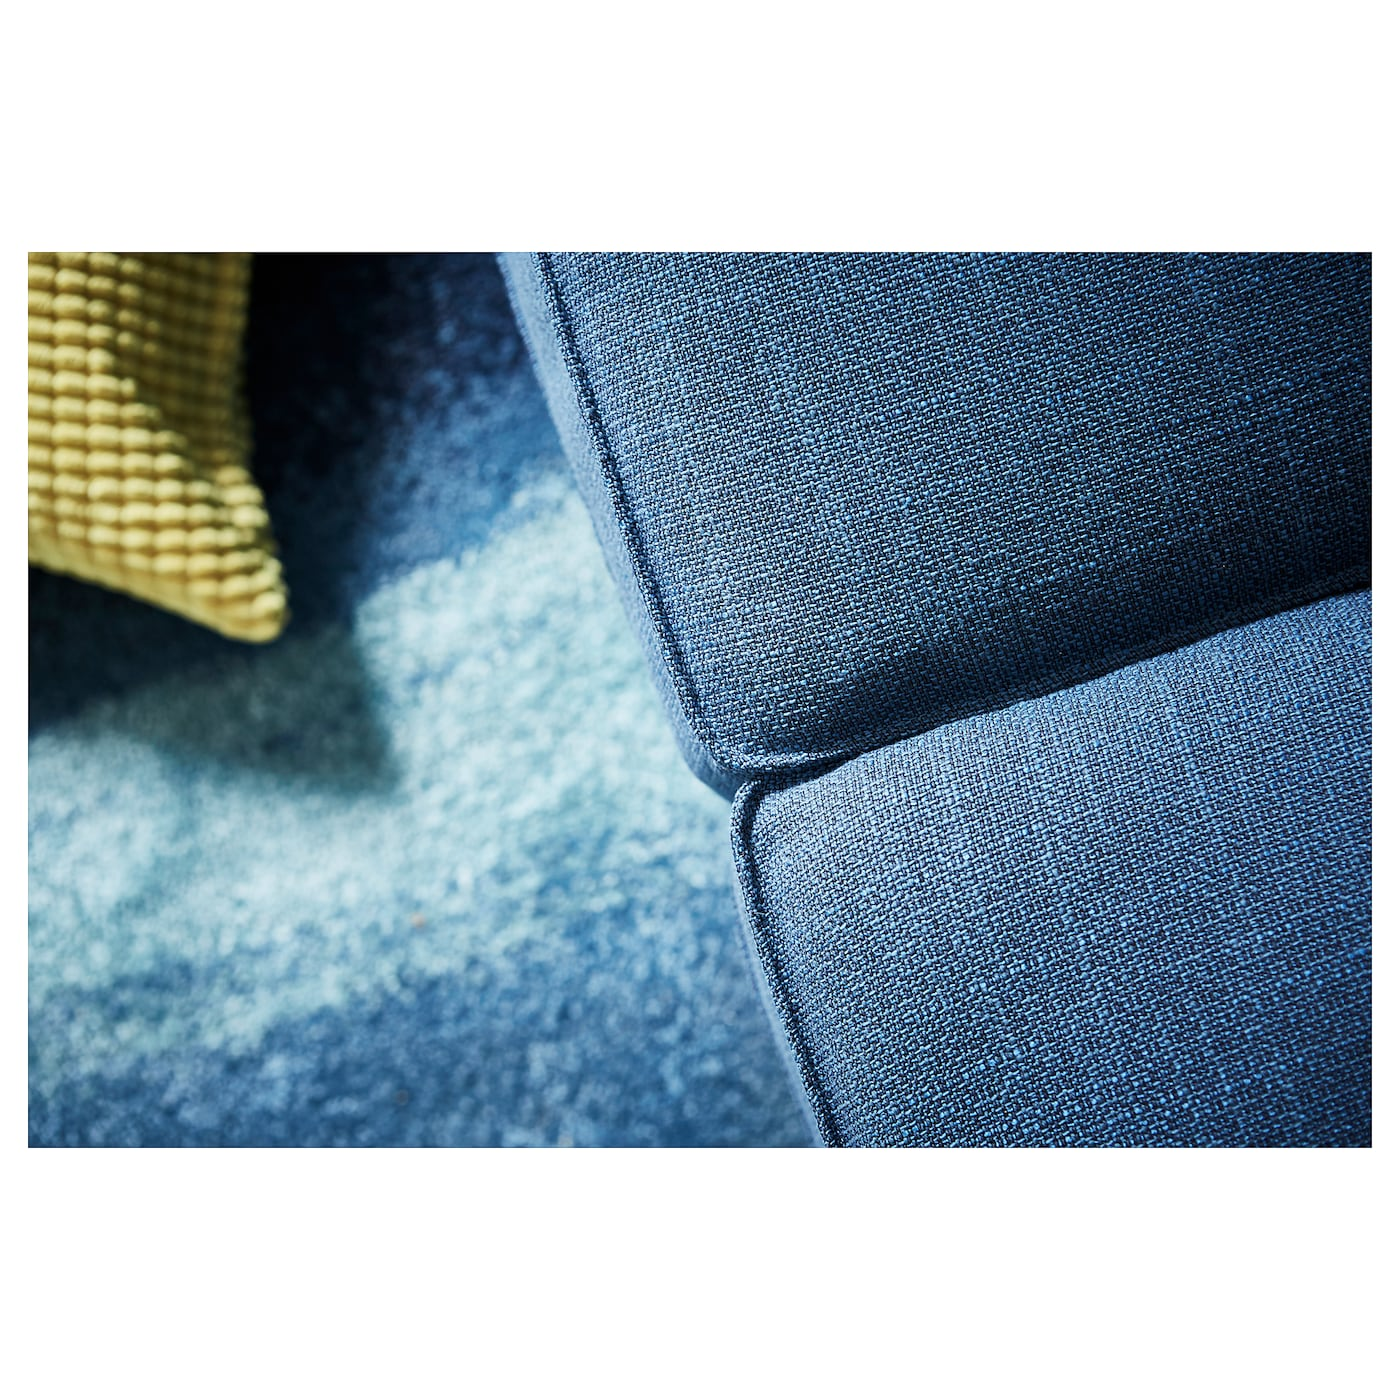 IKEA KIVIK Corner Sofa, 5 Seat 10 Year Guarantee. Read About The Terms